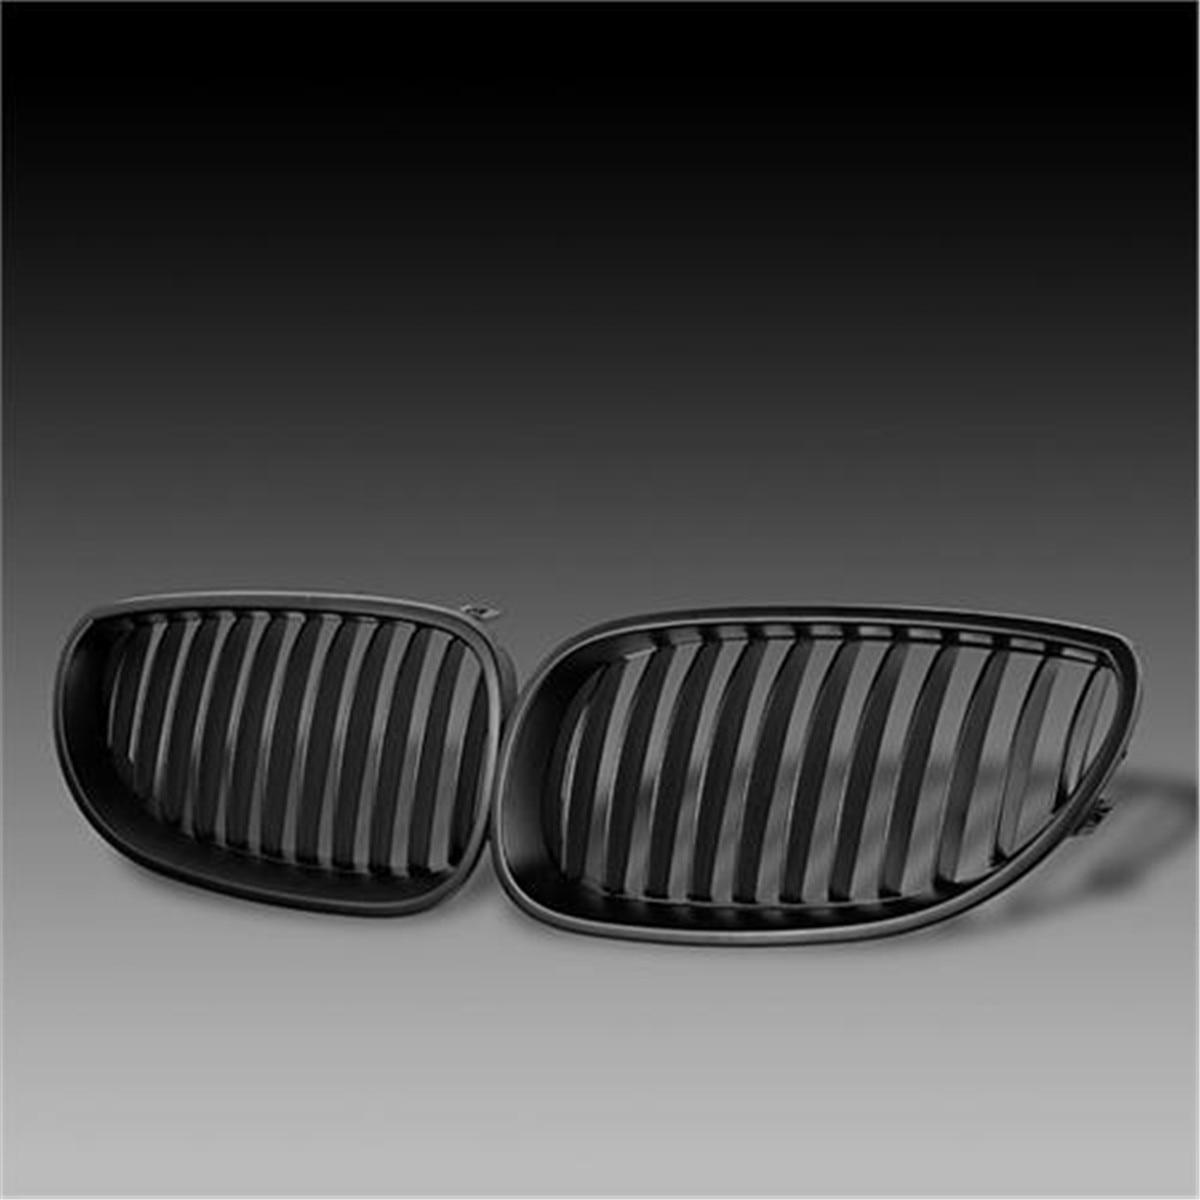 Front Black Sport Wide Kidney Grille Grill For BMW E60 E61 5 Series M5 2003-2009 e60 abs front kidney grille grill for bmw 5 series e60 2004 2009 sedan e61 hatchback 1 slat 2 slat 535i 545i